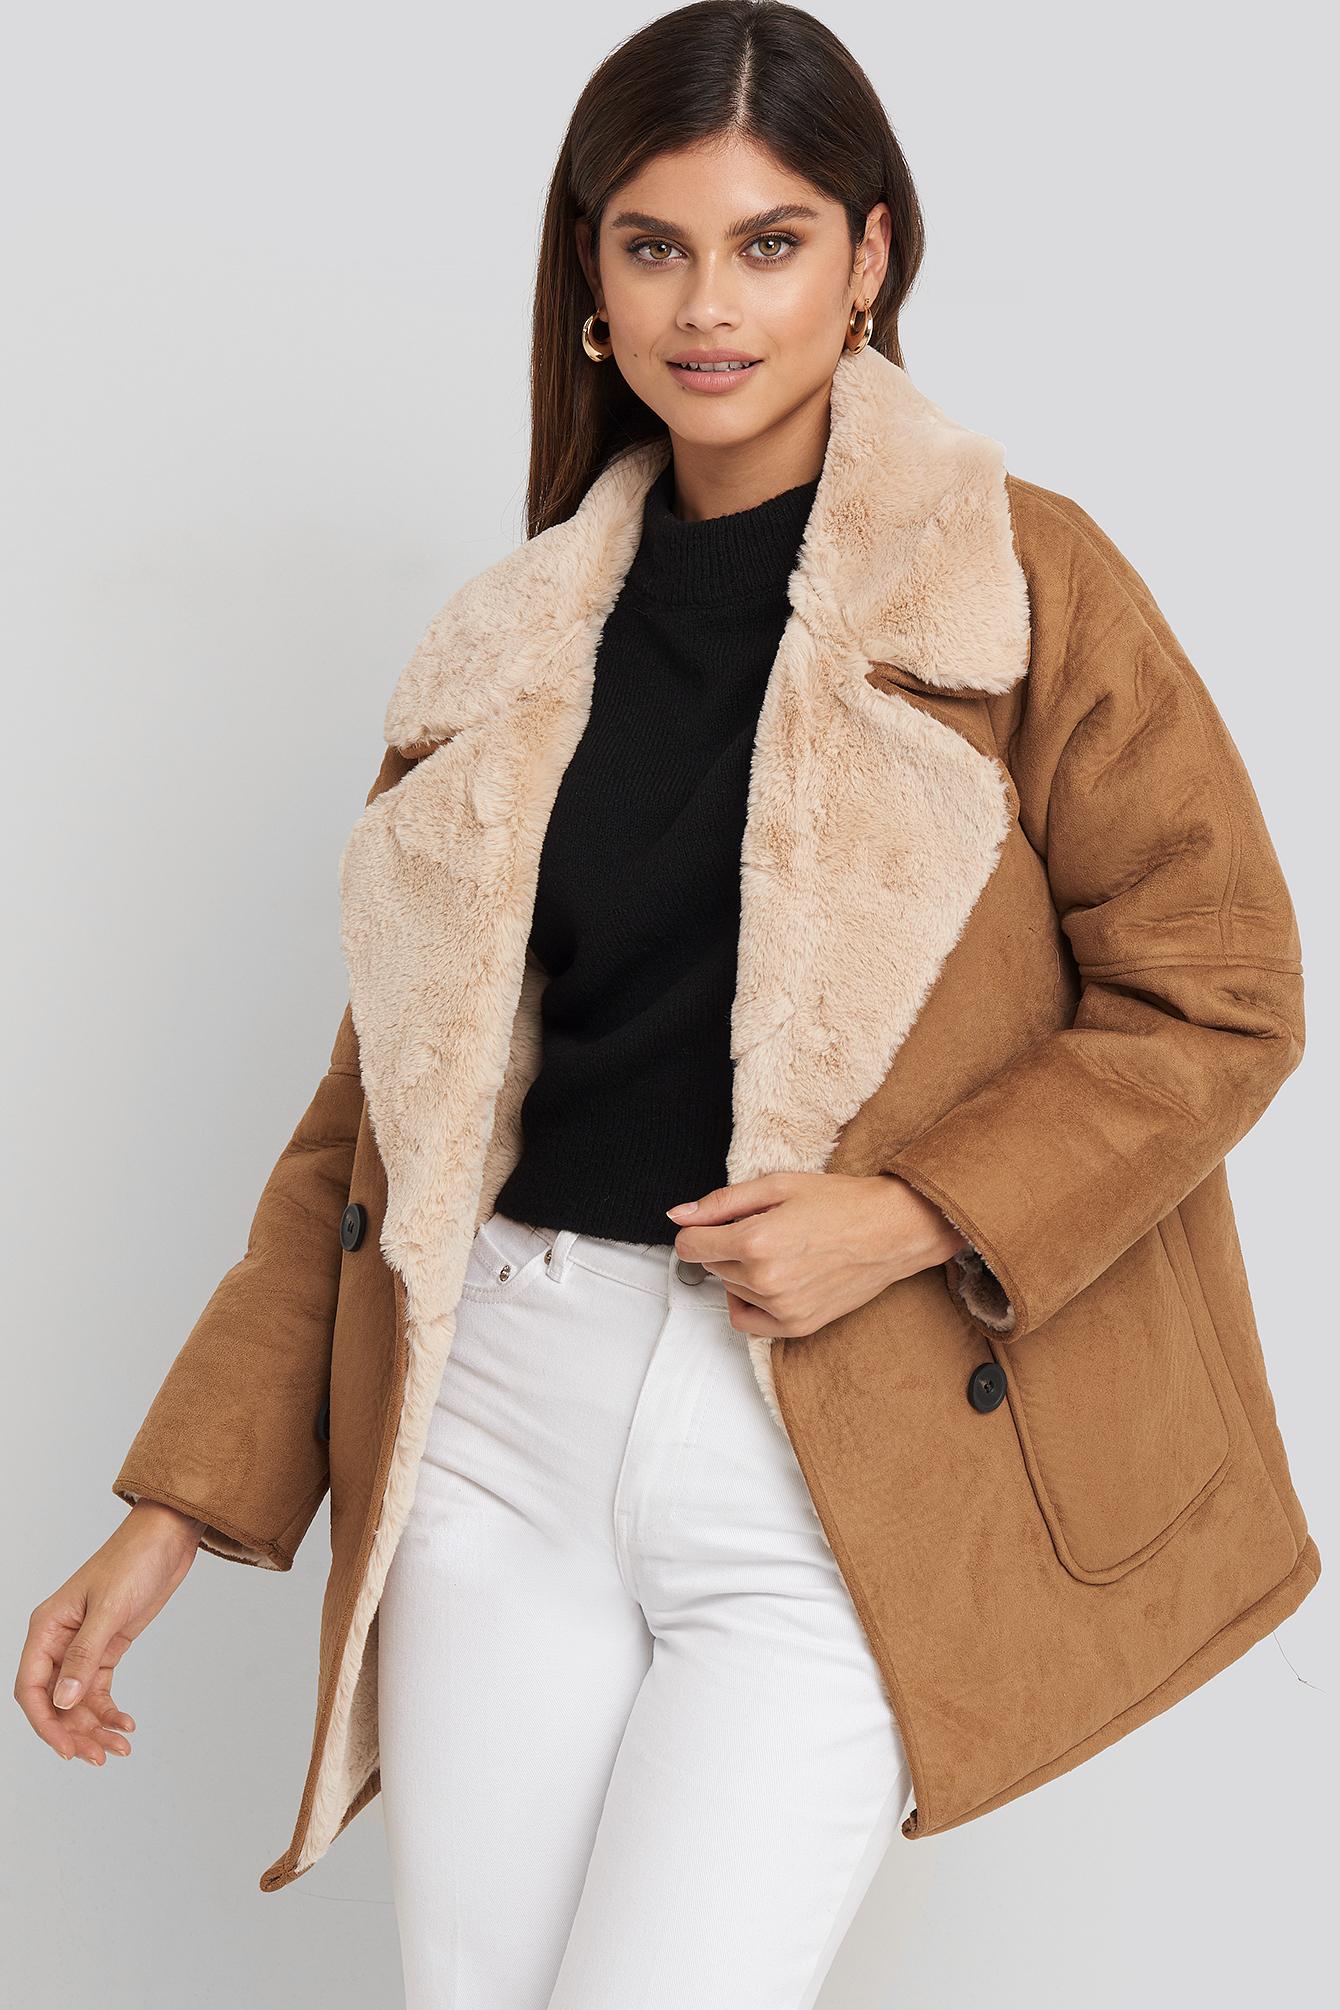 na-kd trend -  Faux Suede Fur Bonded Jacket - Brown,Beige